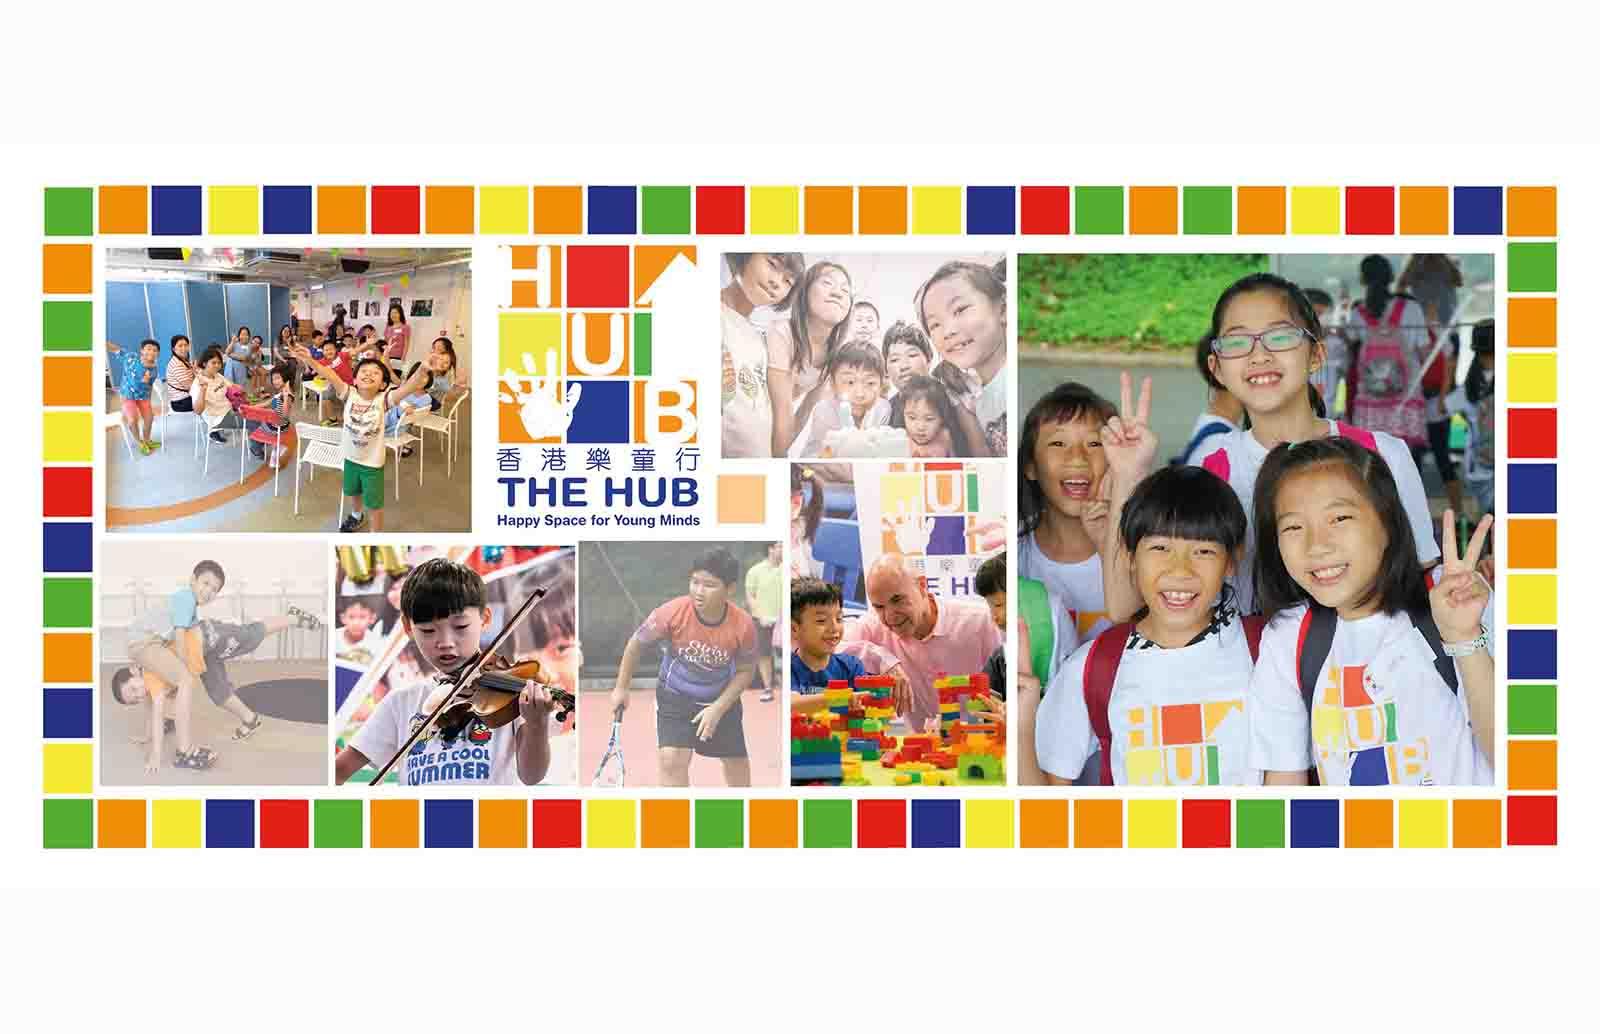 the hub hong kong kids shelter